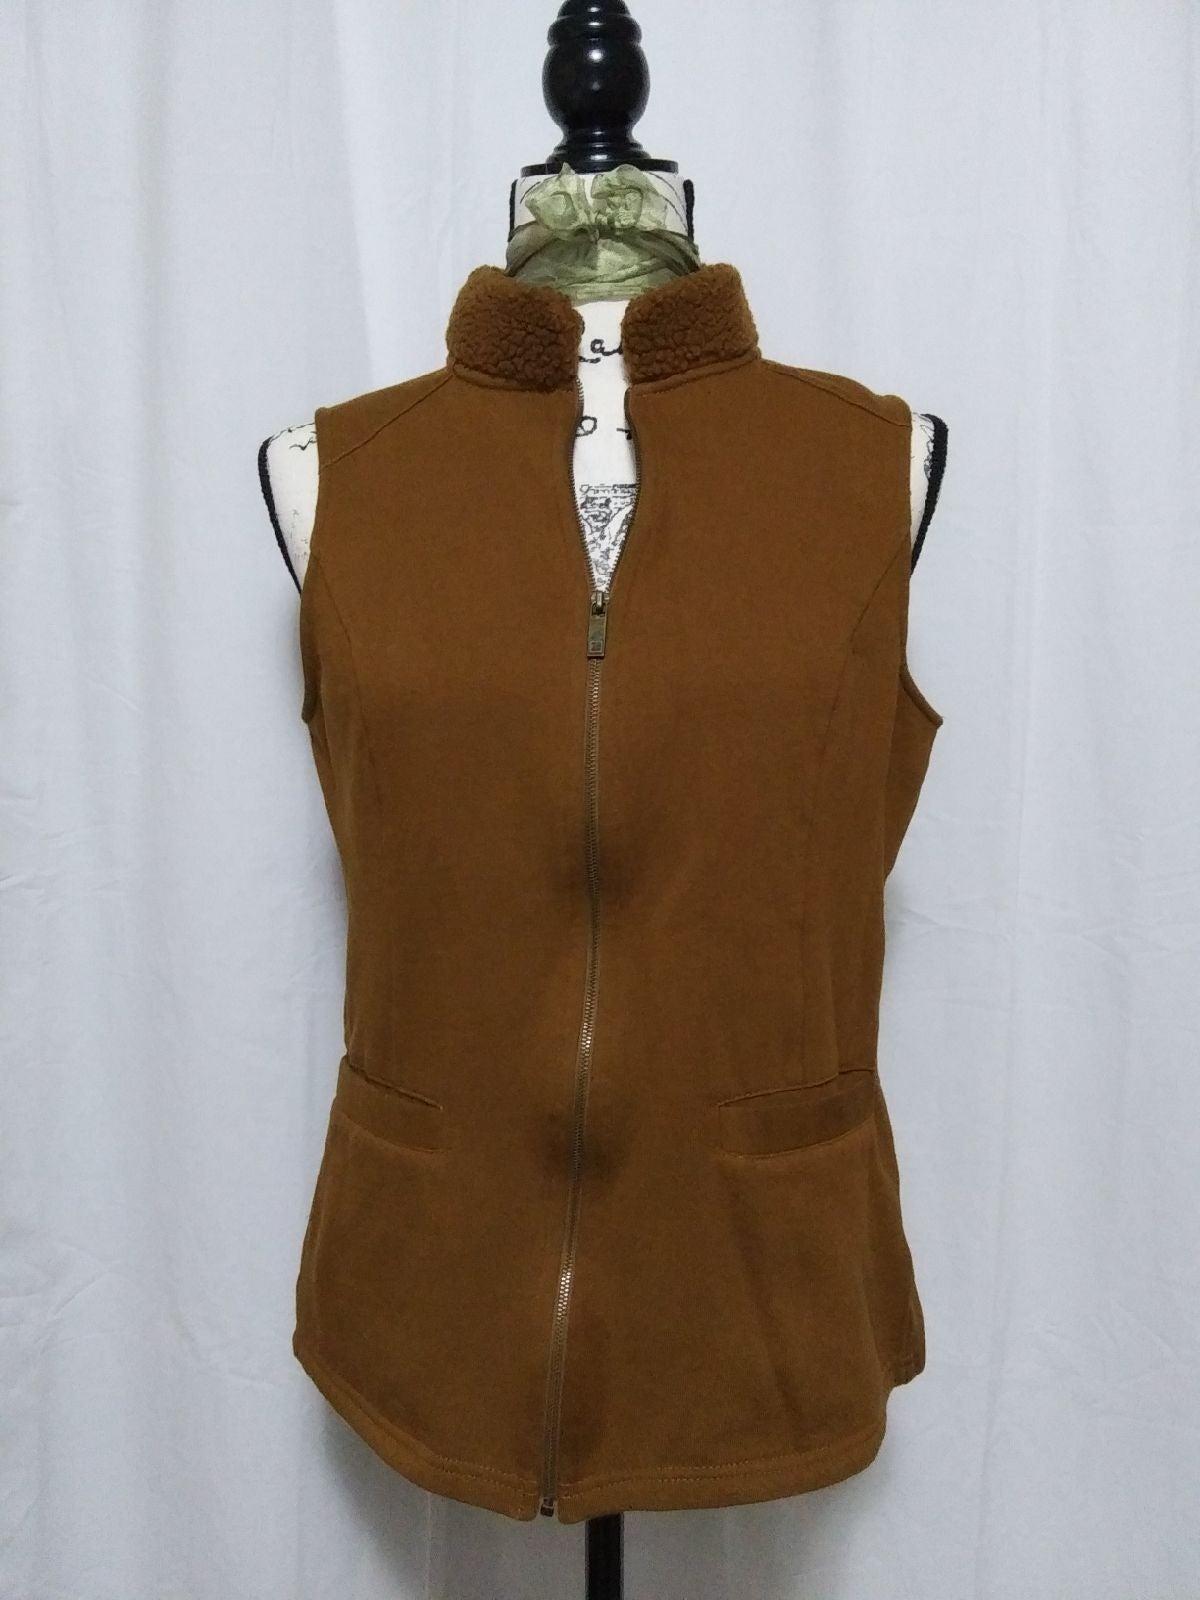 Sherpa fleece collar zippered vest